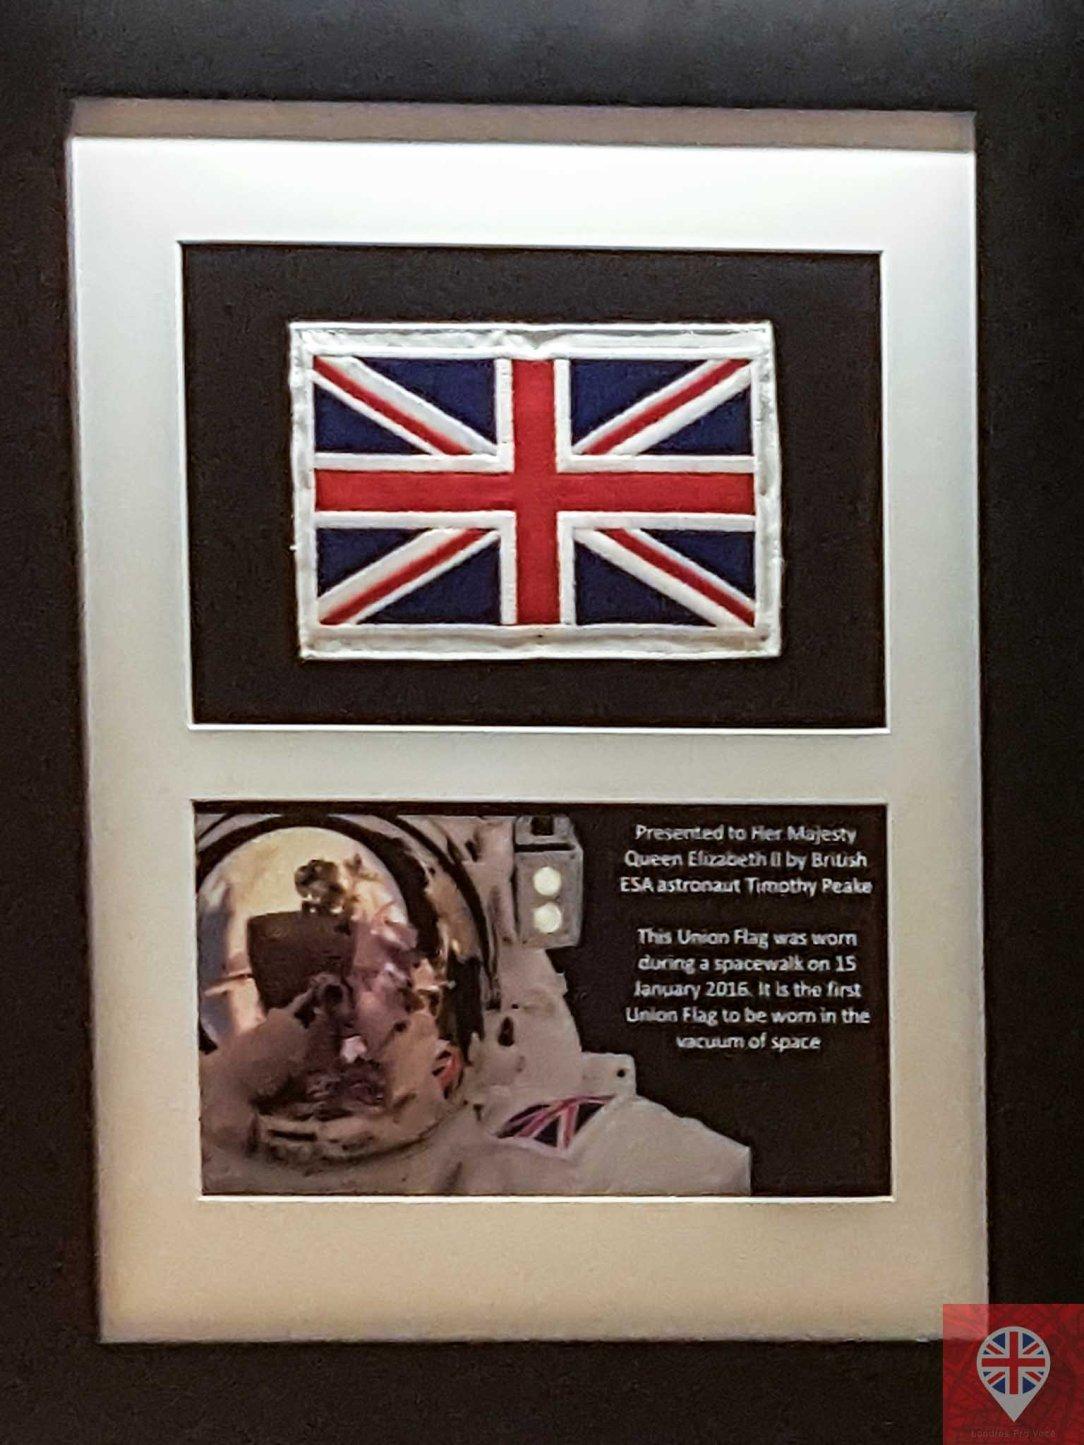 Royal Gifts union flag